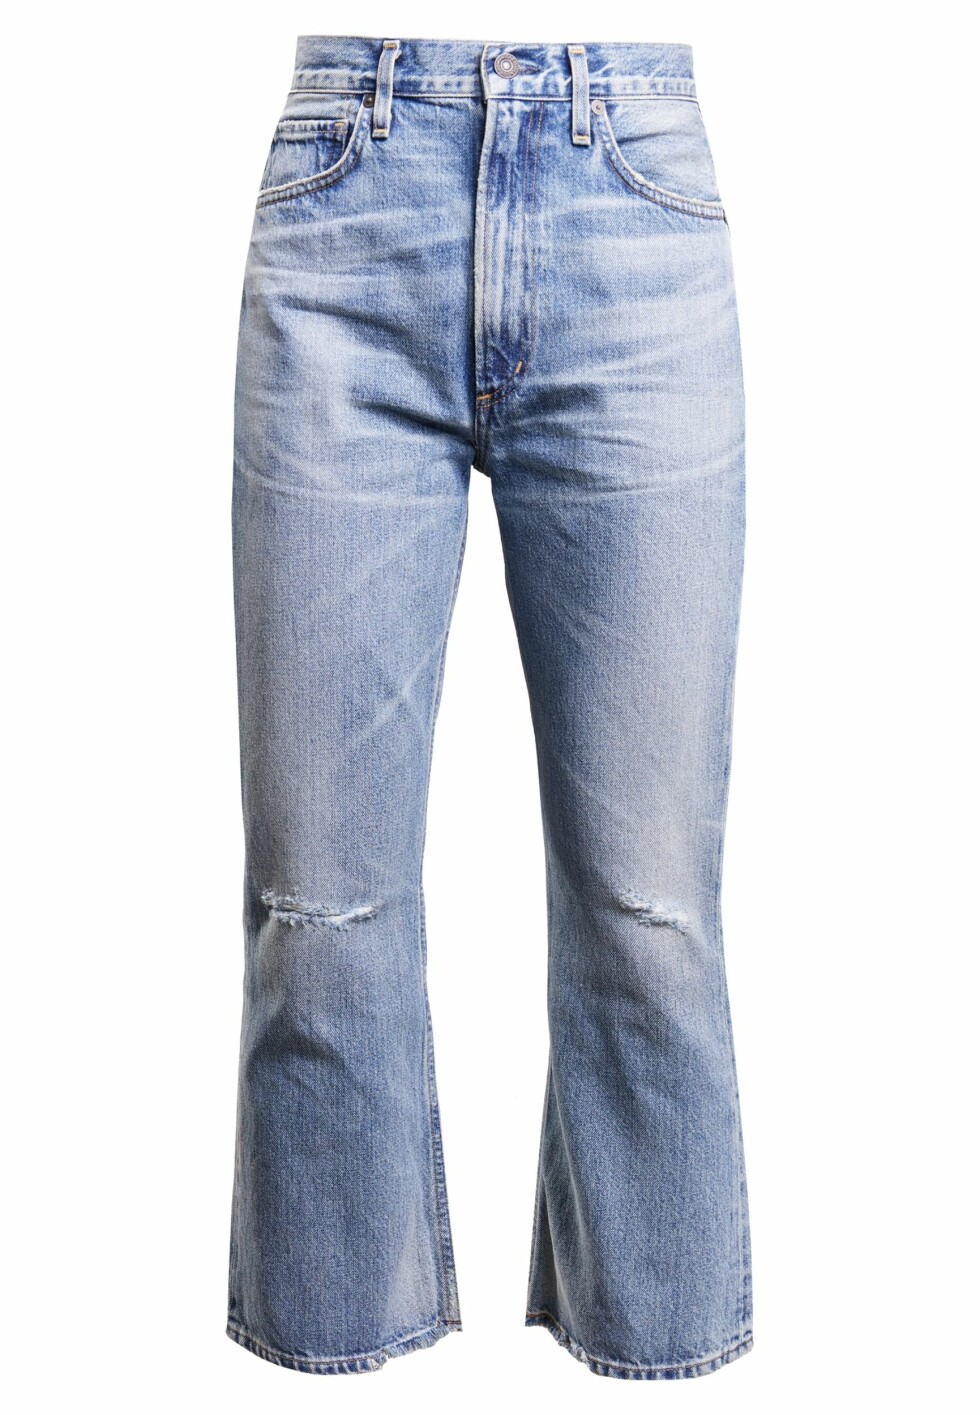 Jeans fra Citizens of Humanity via Zalando.no  3495,-  https://www.zalando.no/citizens-of-humanity-estella-flared-jeans-freebird-ci221n034-k11.html